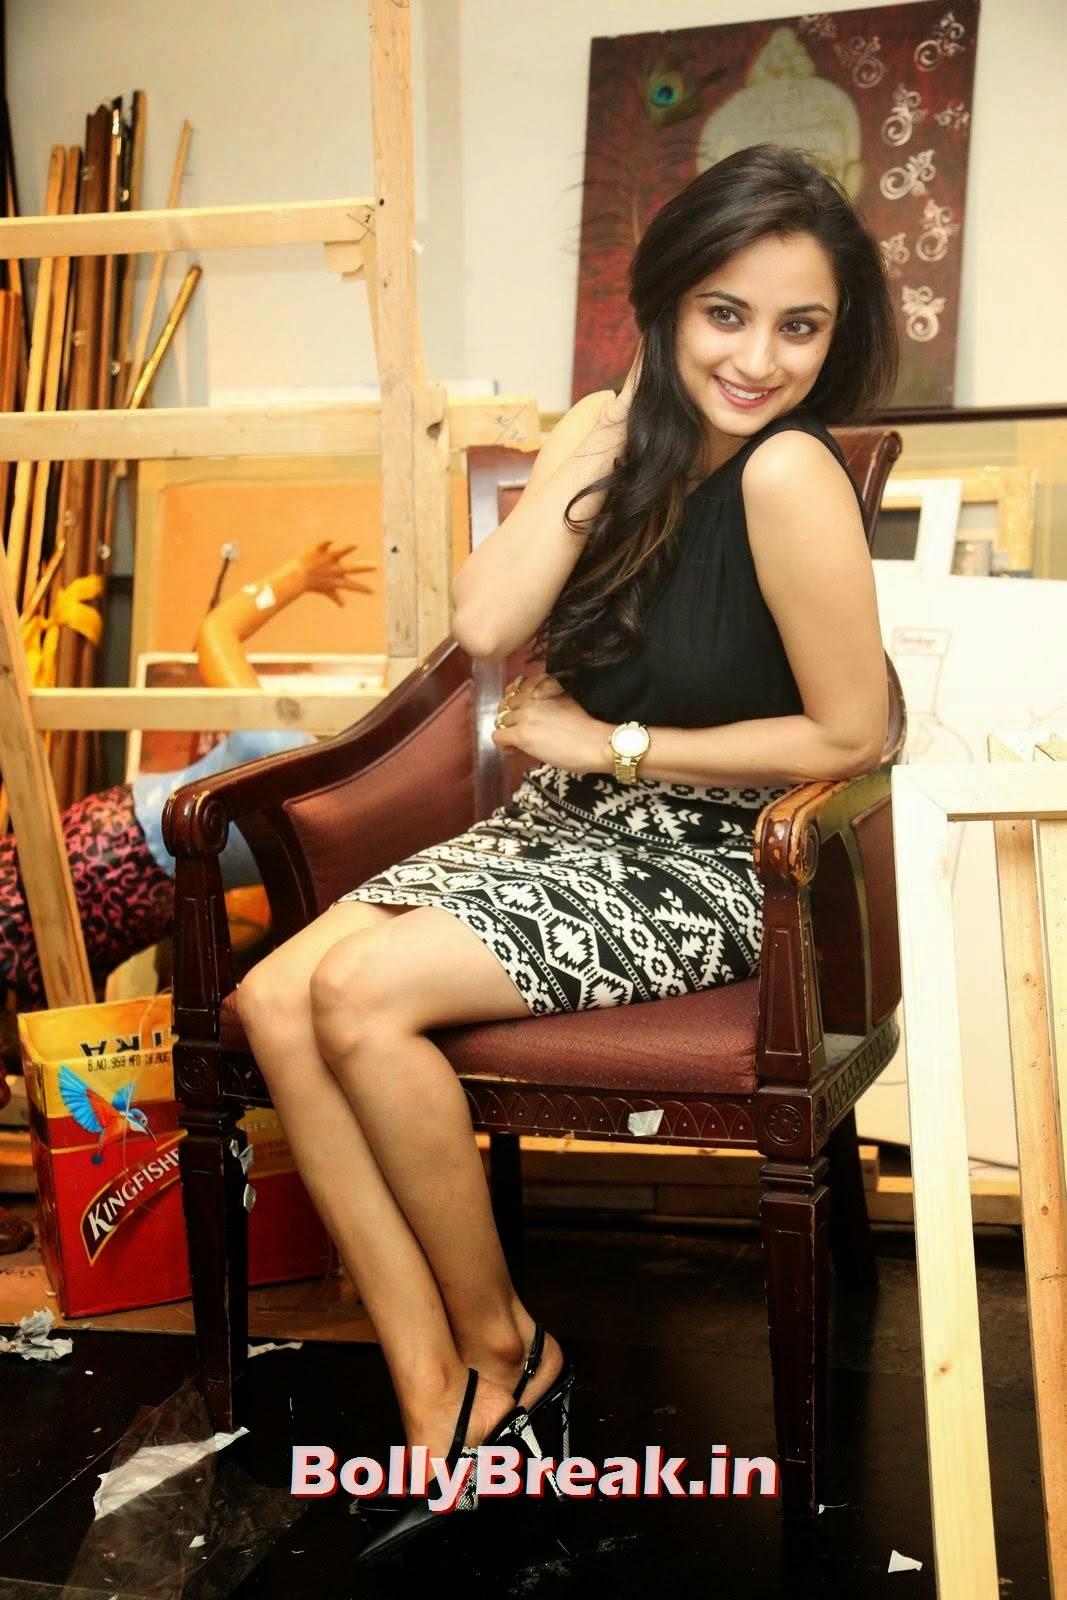 Madirakshi Photoshoot Stills, Actress Madirakshi Hot Pics in Skirt & Black Top